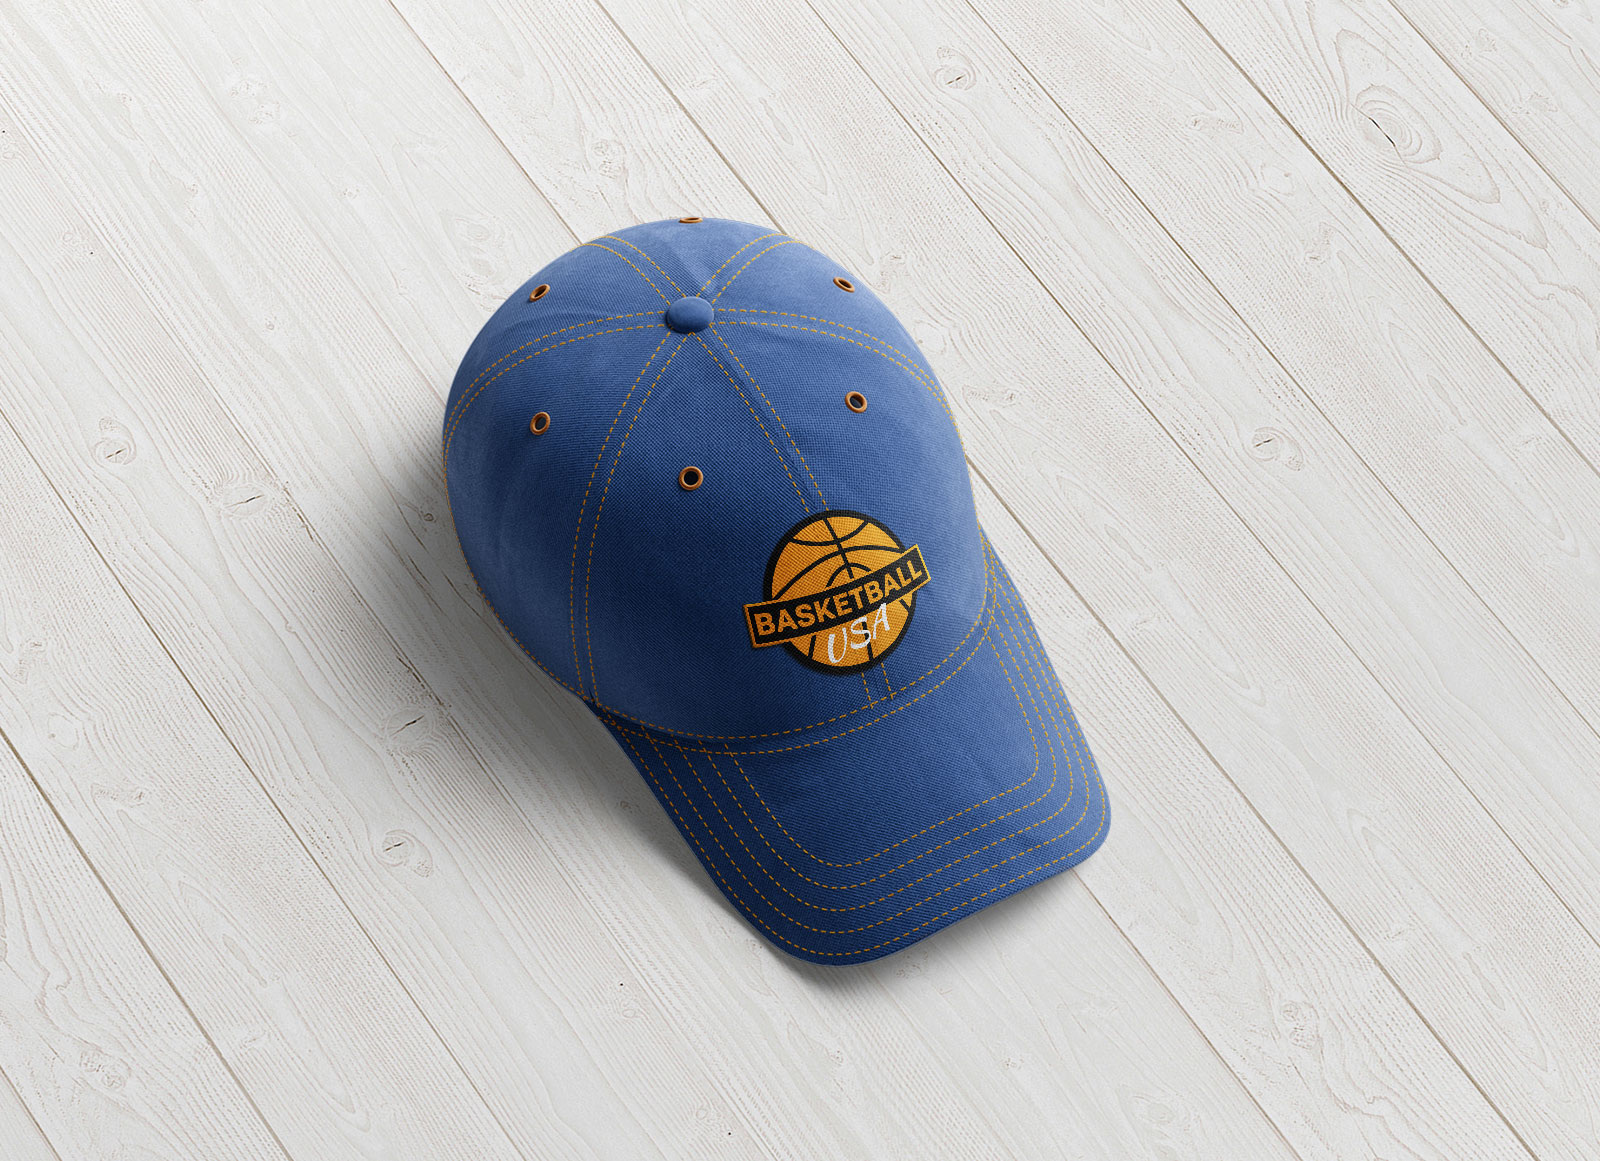 Free-Premium-Quality-Baseball-P-Cap-Mockup-PSD-(Top-View)